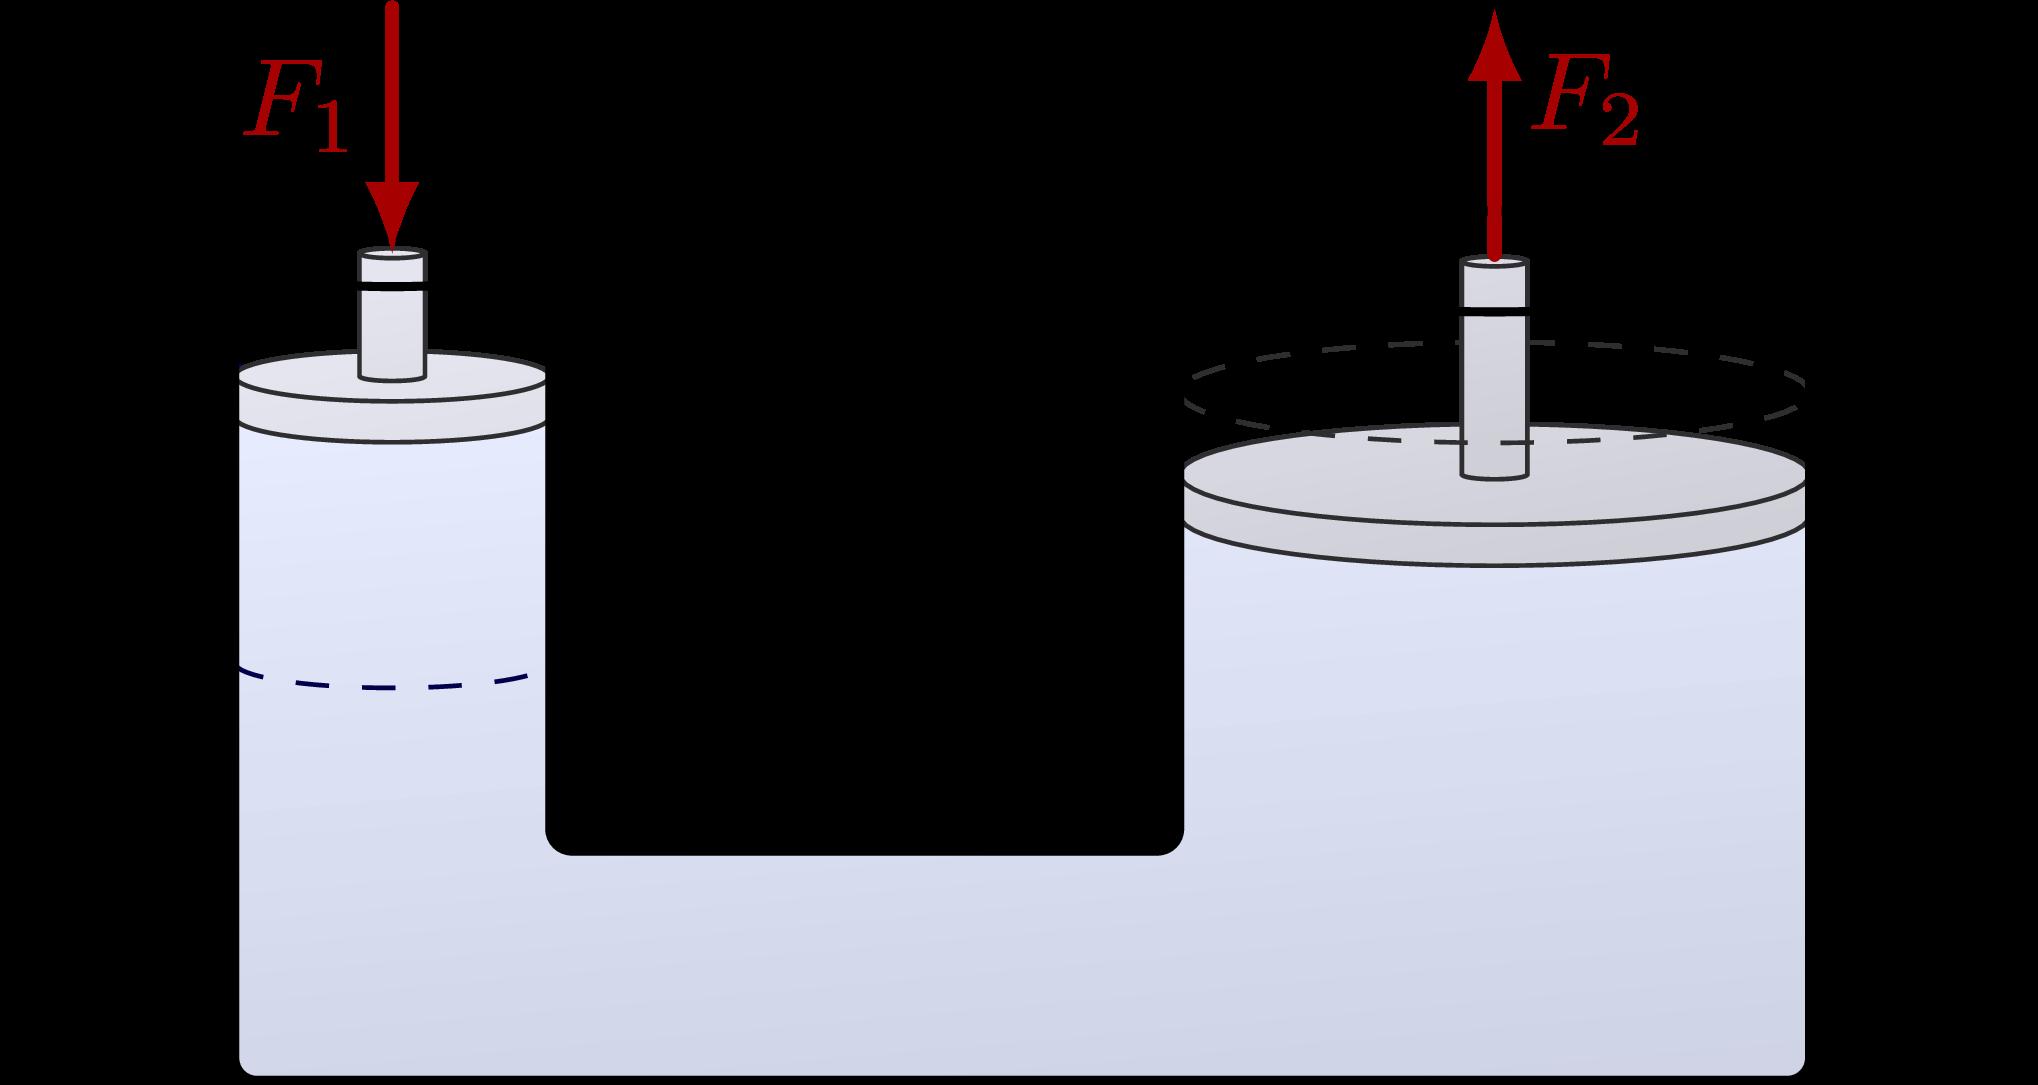 fluid_dynamics_pressure-008.png